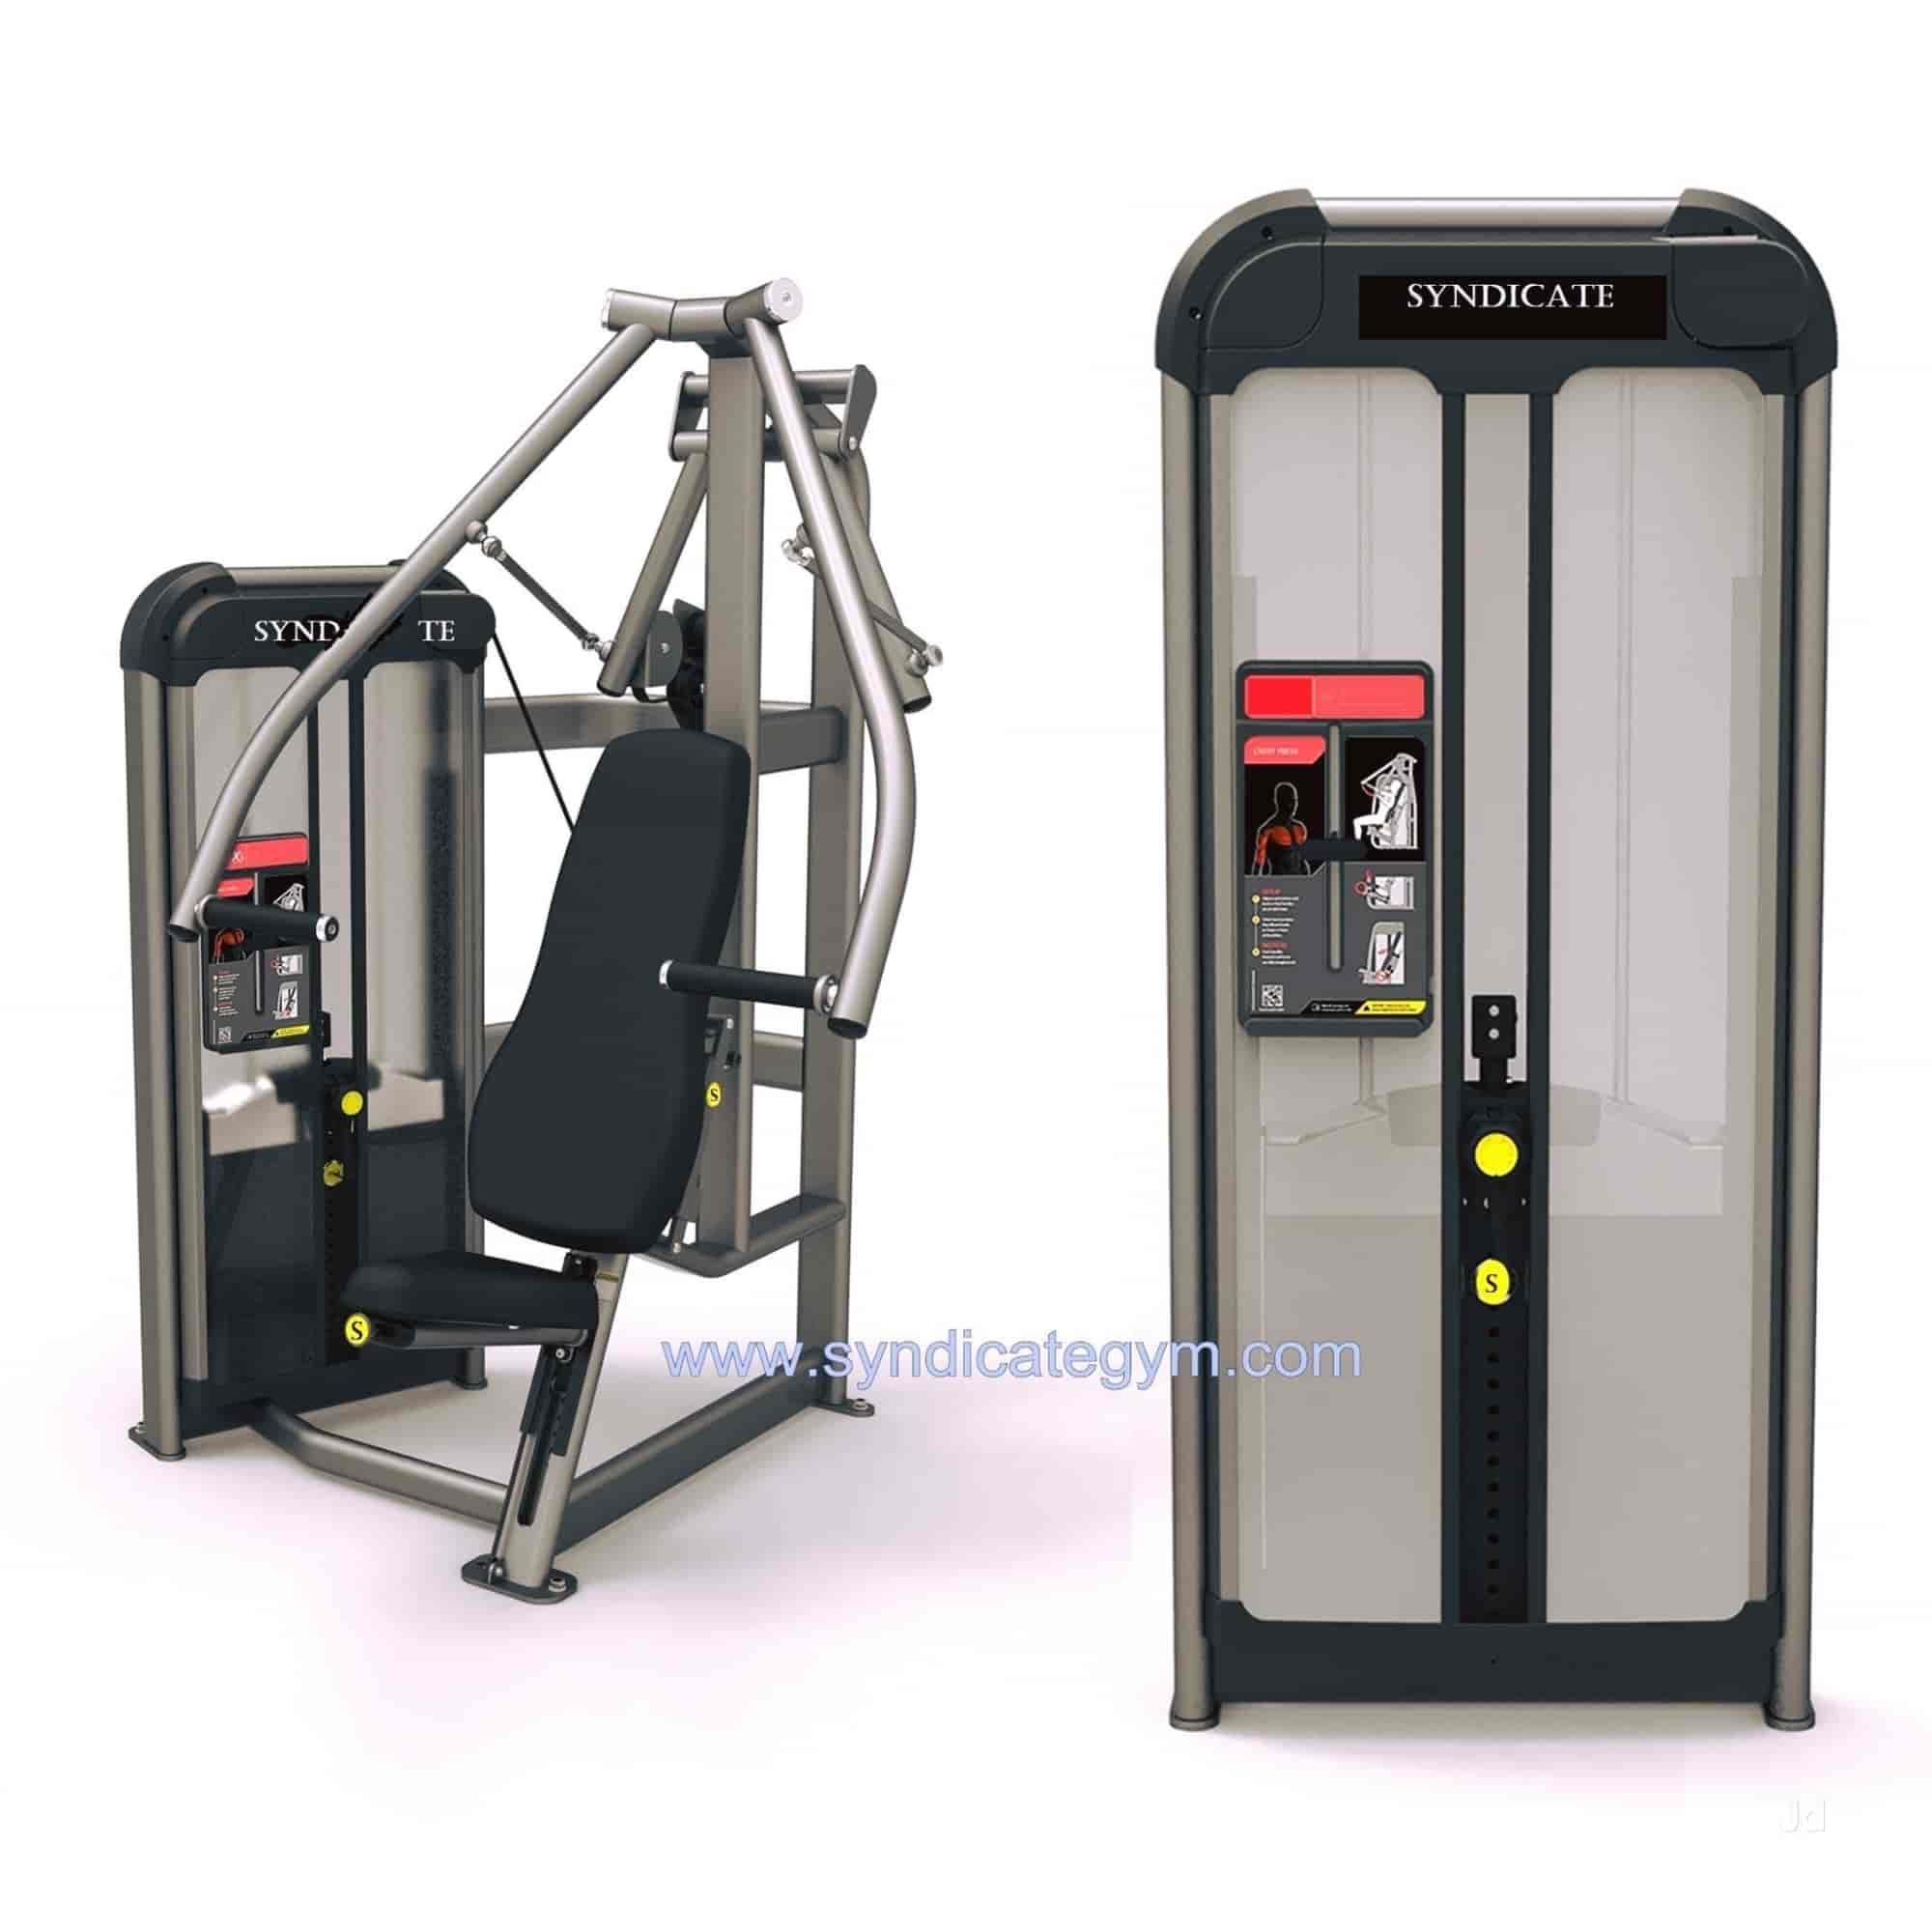 Gym Equipment Market In Delhi: Imported Gym Equipments Manufacturers In India Jalandhar